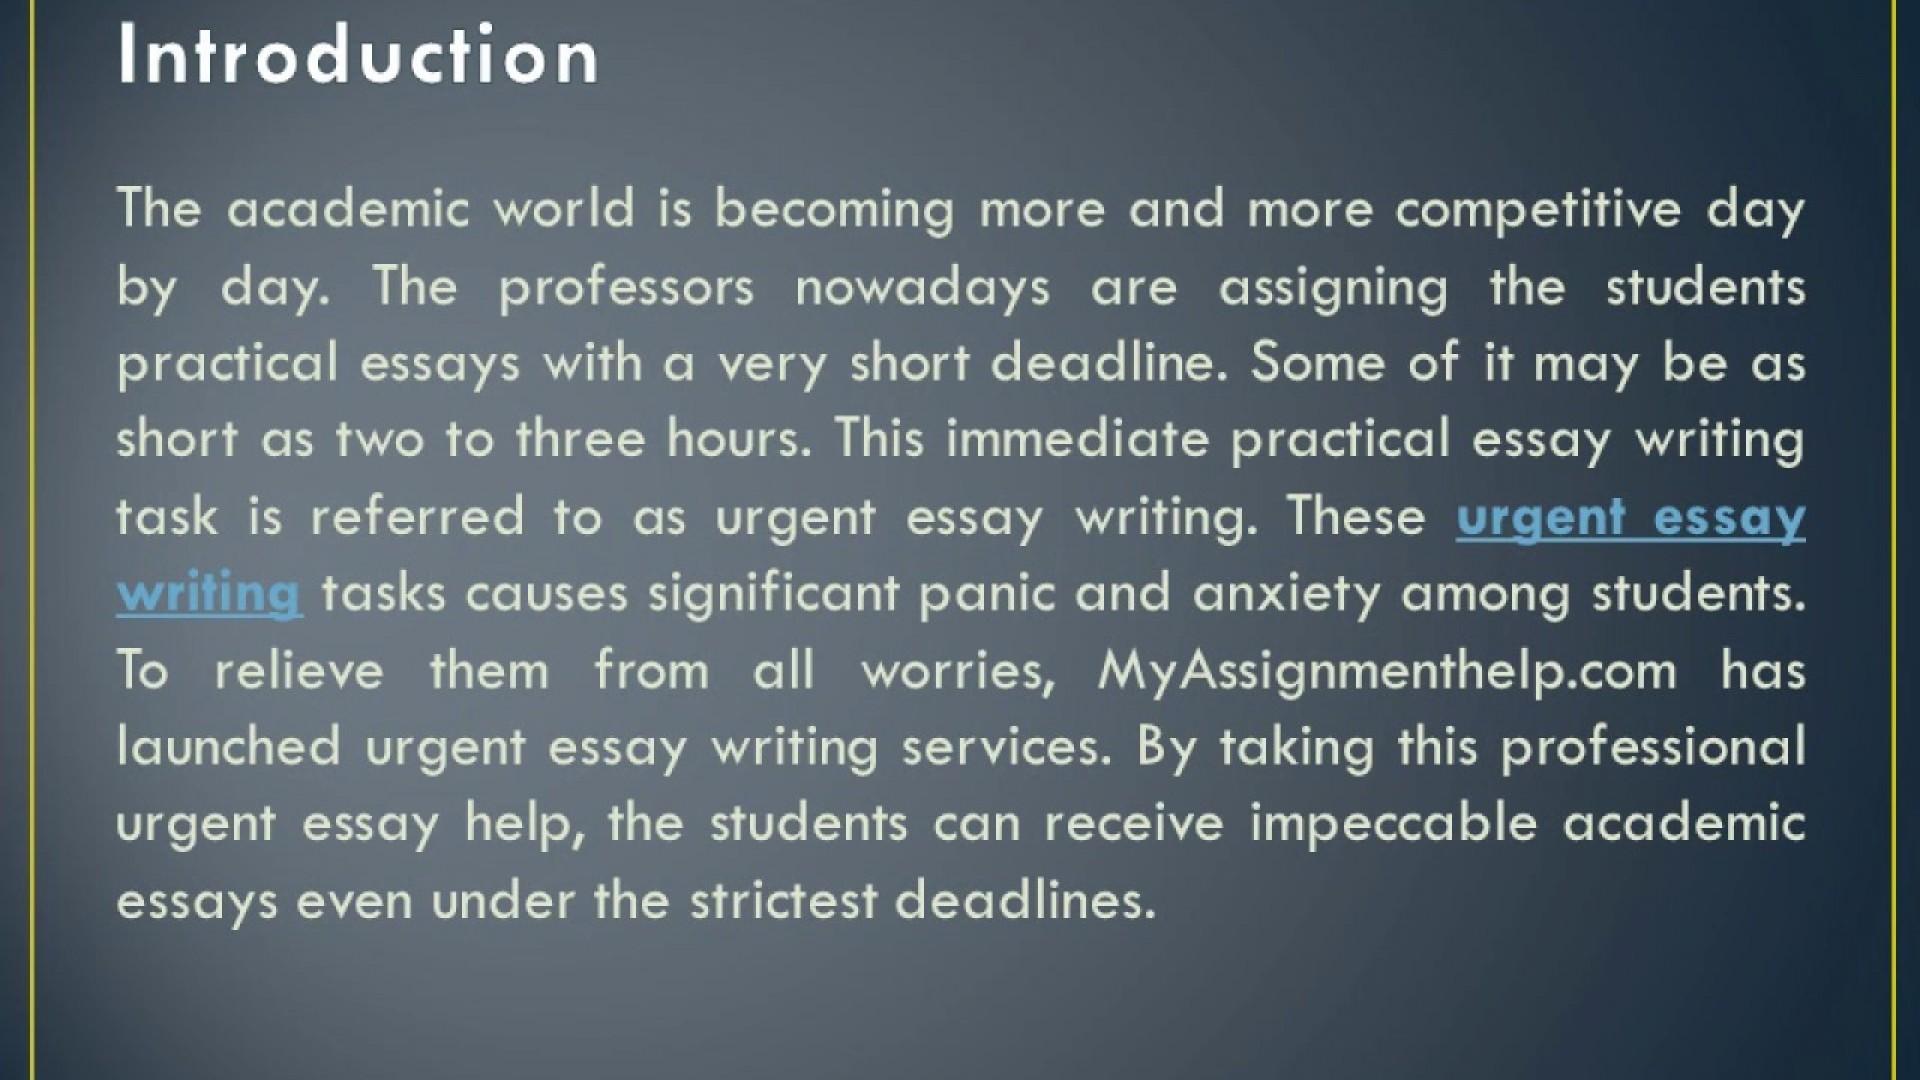 025 Urgent Essay Maxresdefault Impressive Work Code Custom Essays 1920